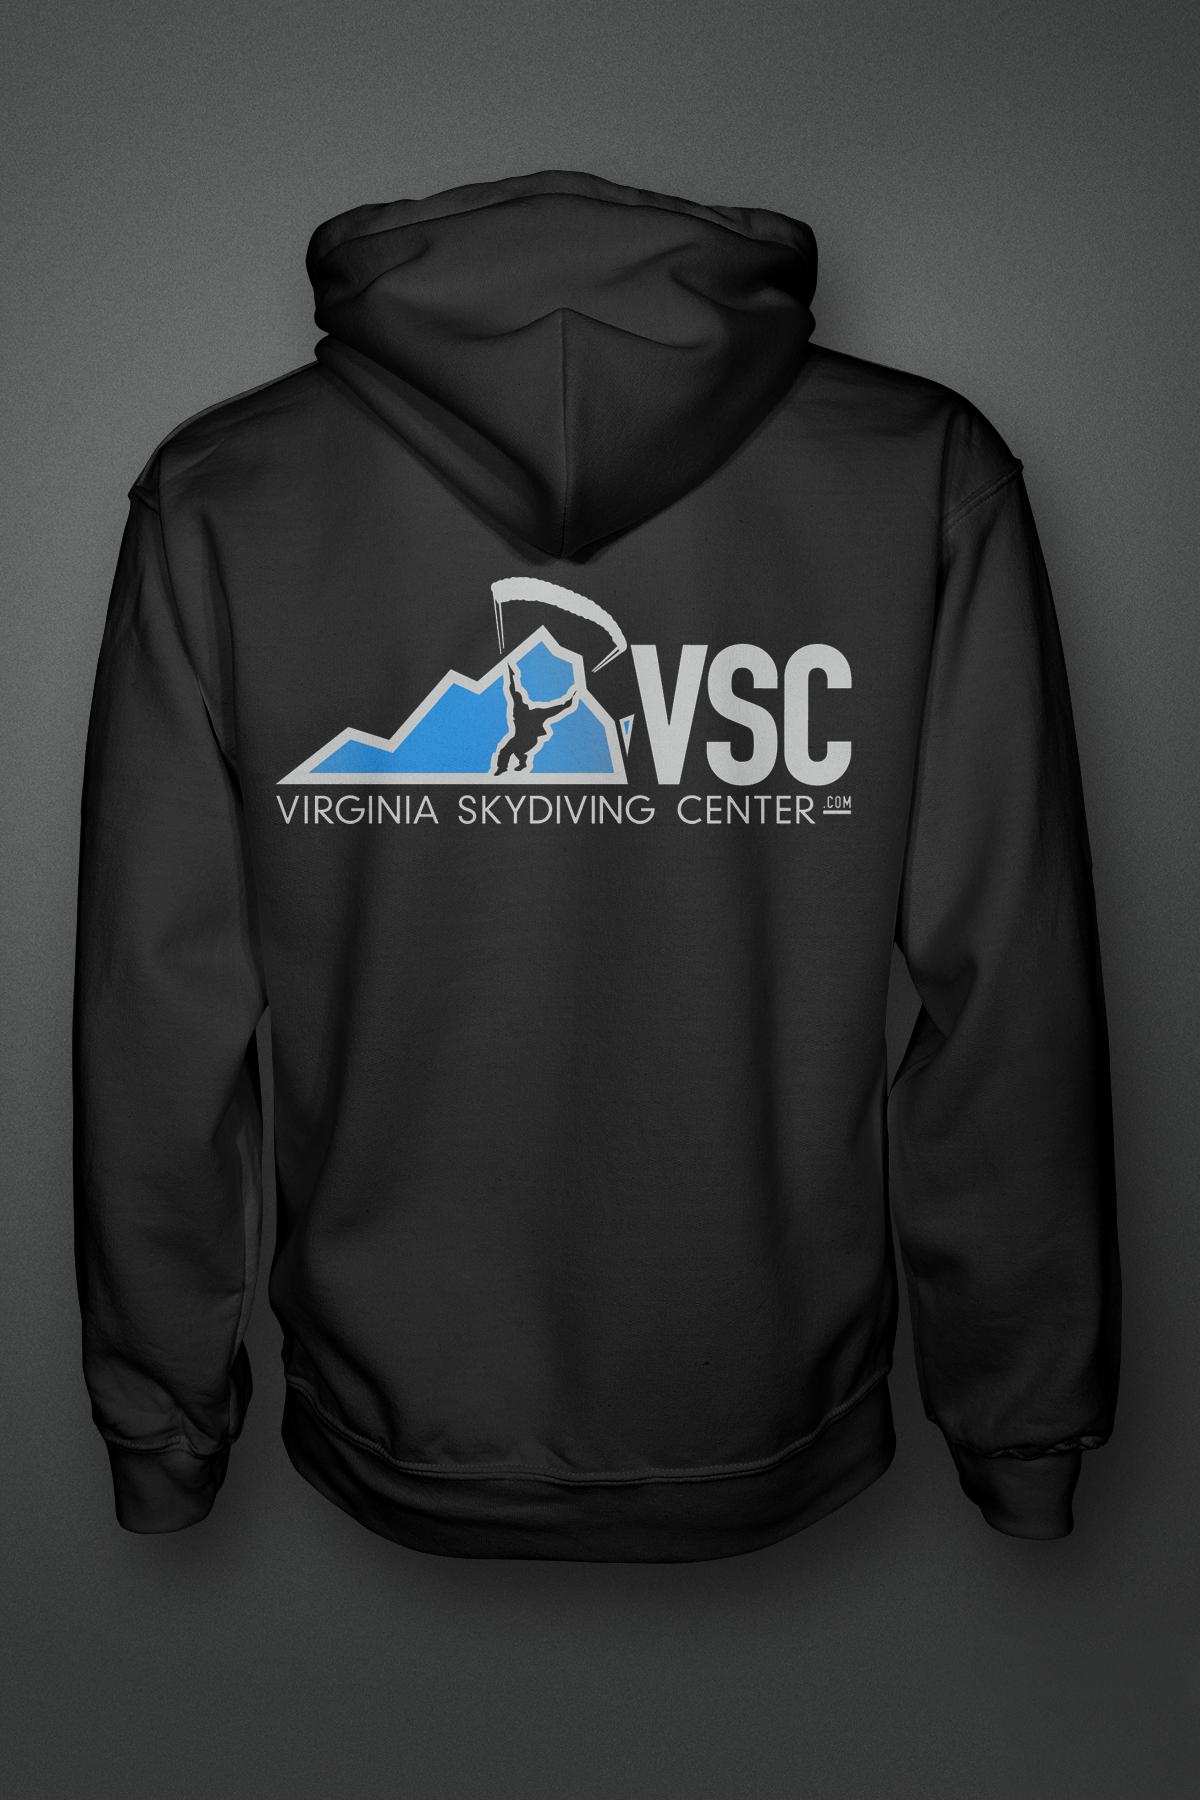 VSC_BACK RENDER